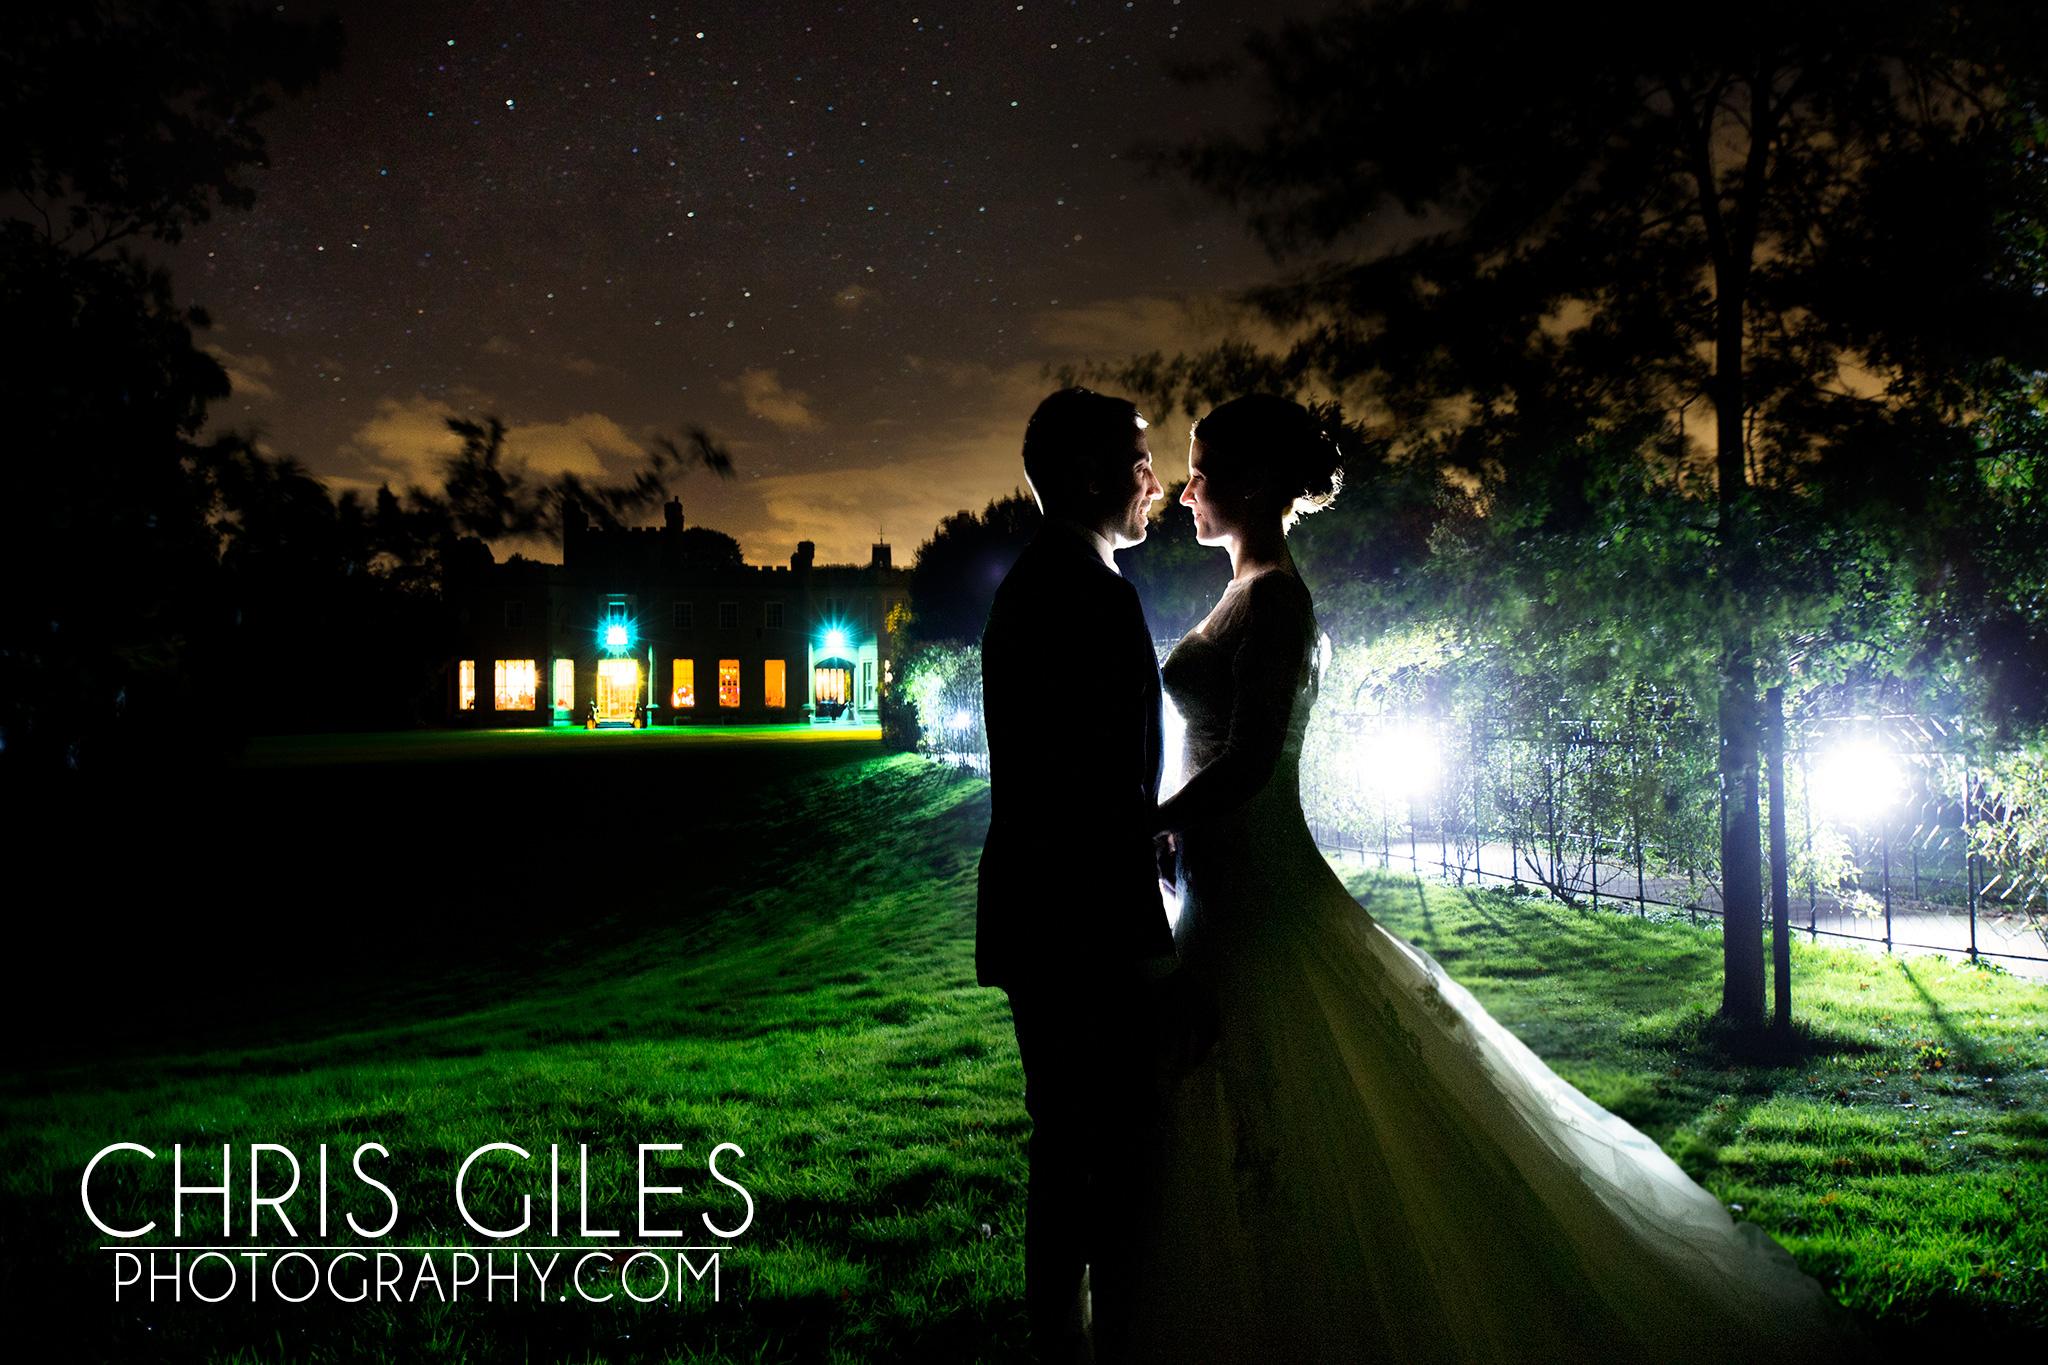 Nonsuch-Mansion-Surrey-Wedding-Venue-Chris-Giles